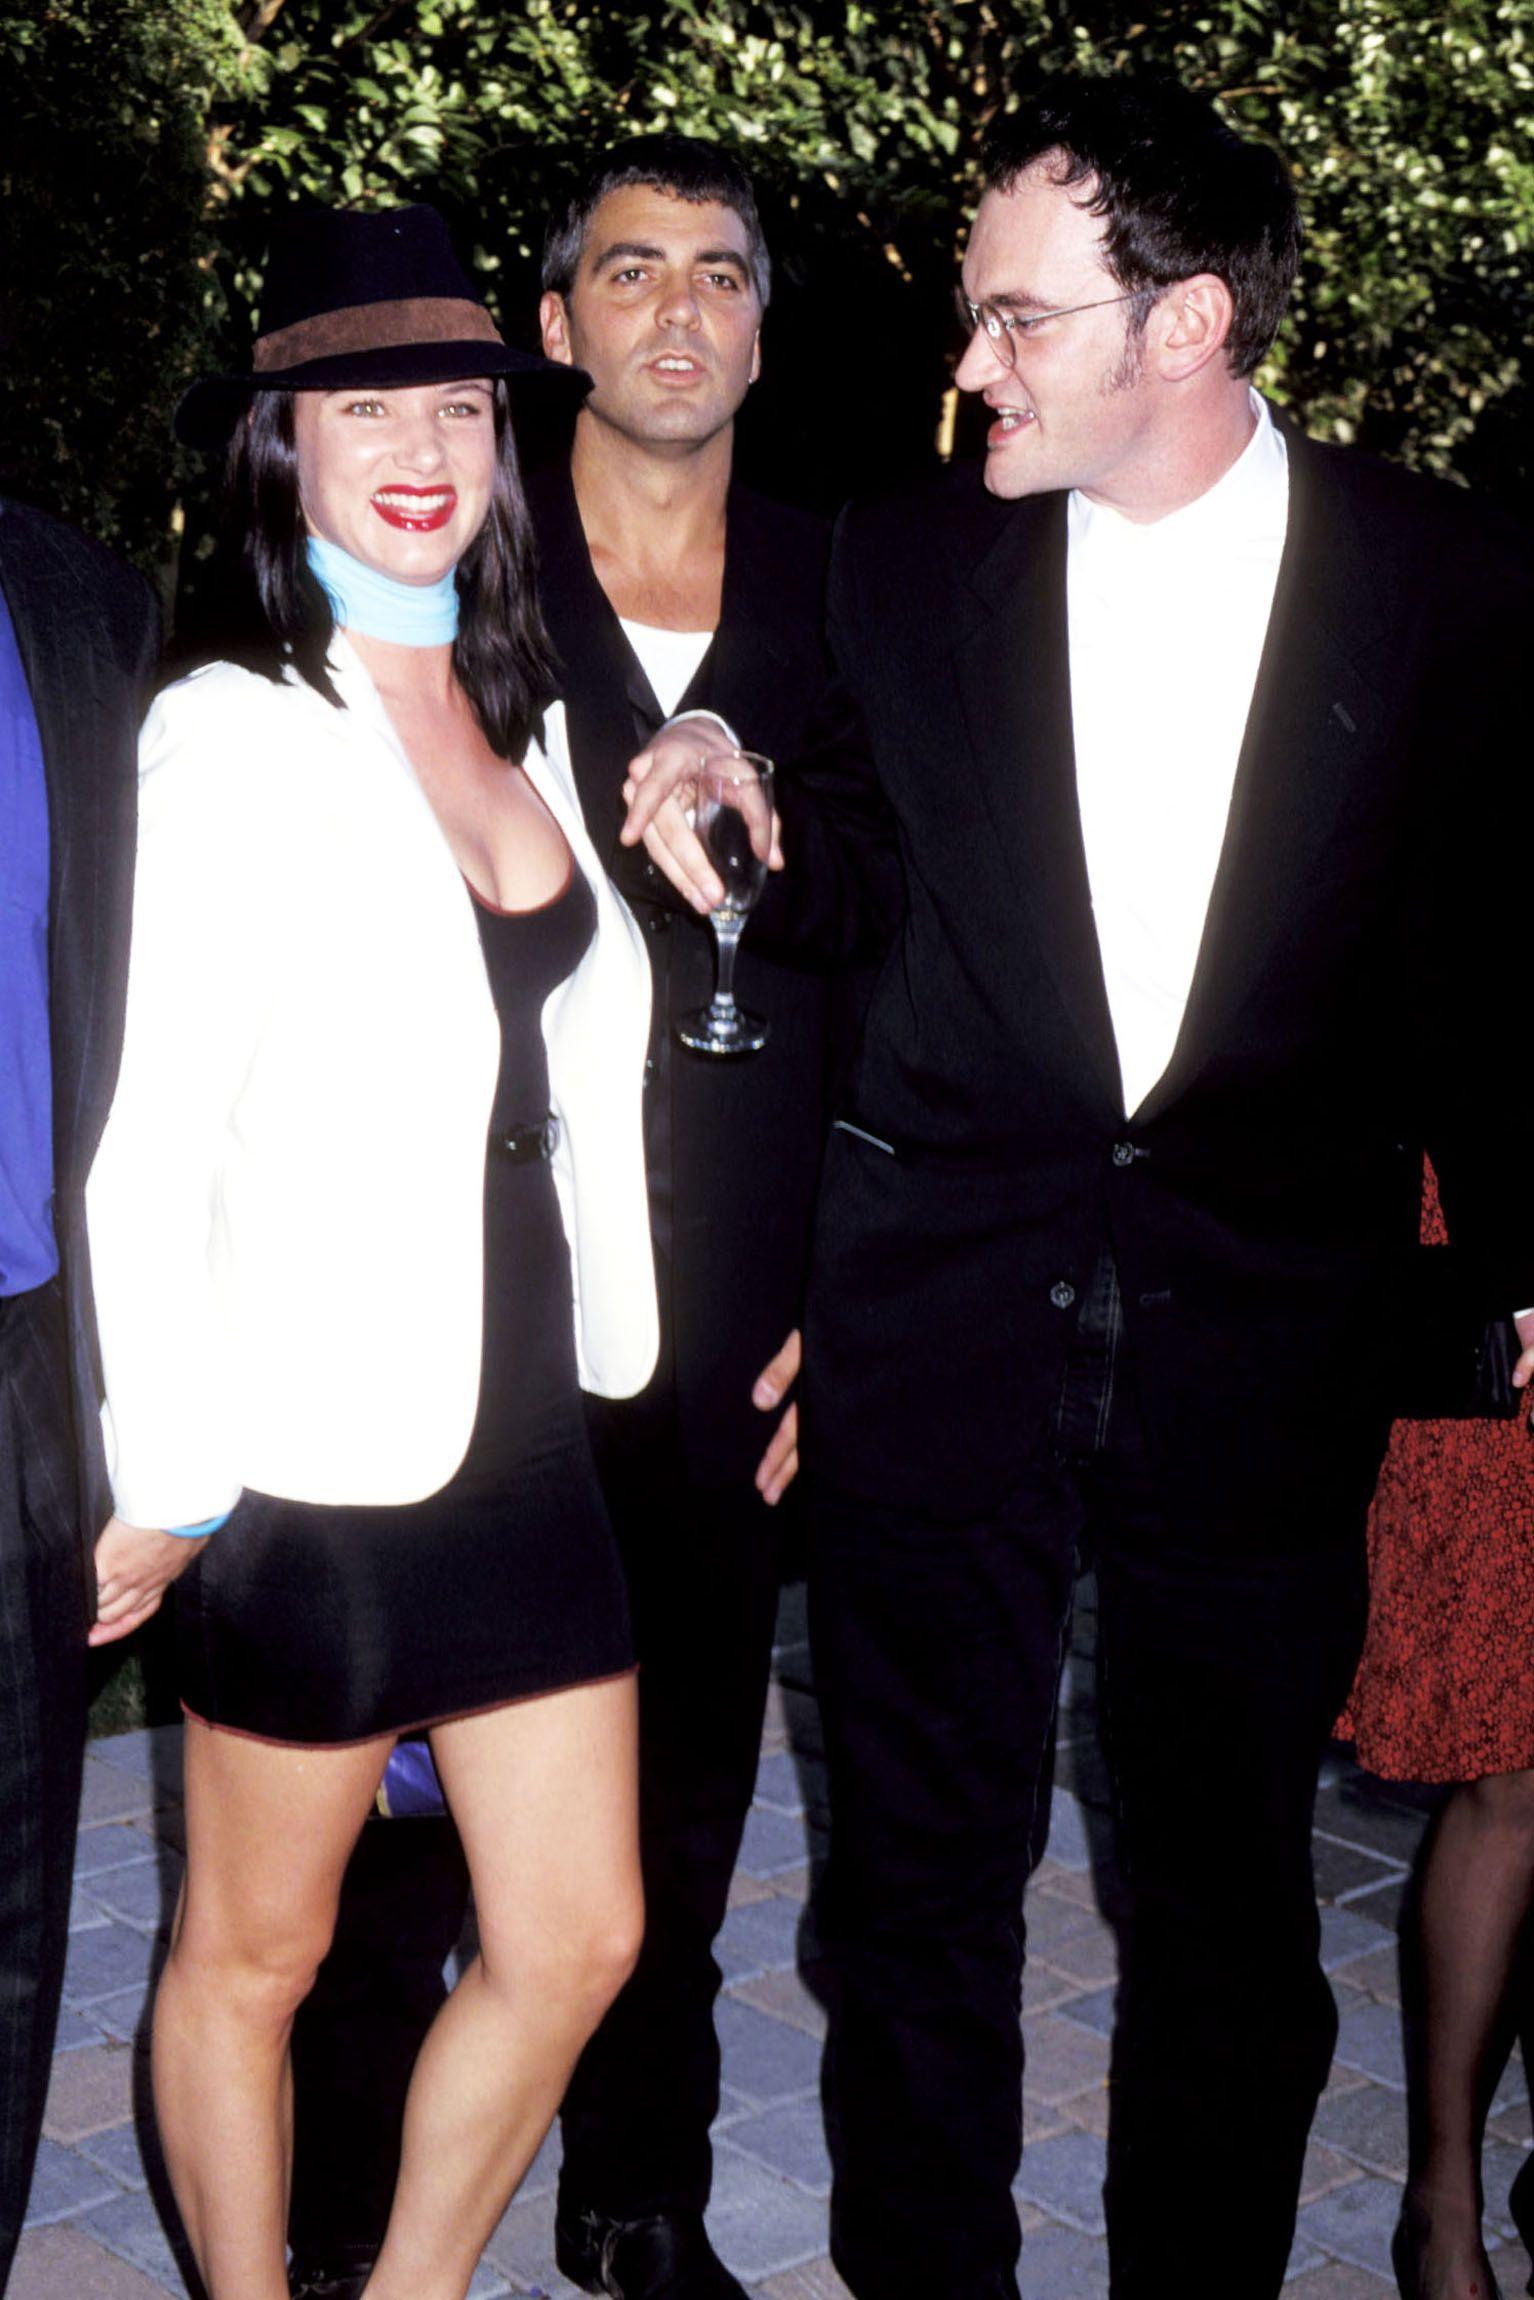 Juliette Lewis, Clooney, and Quentin Tarantino in Burbank, Ca.